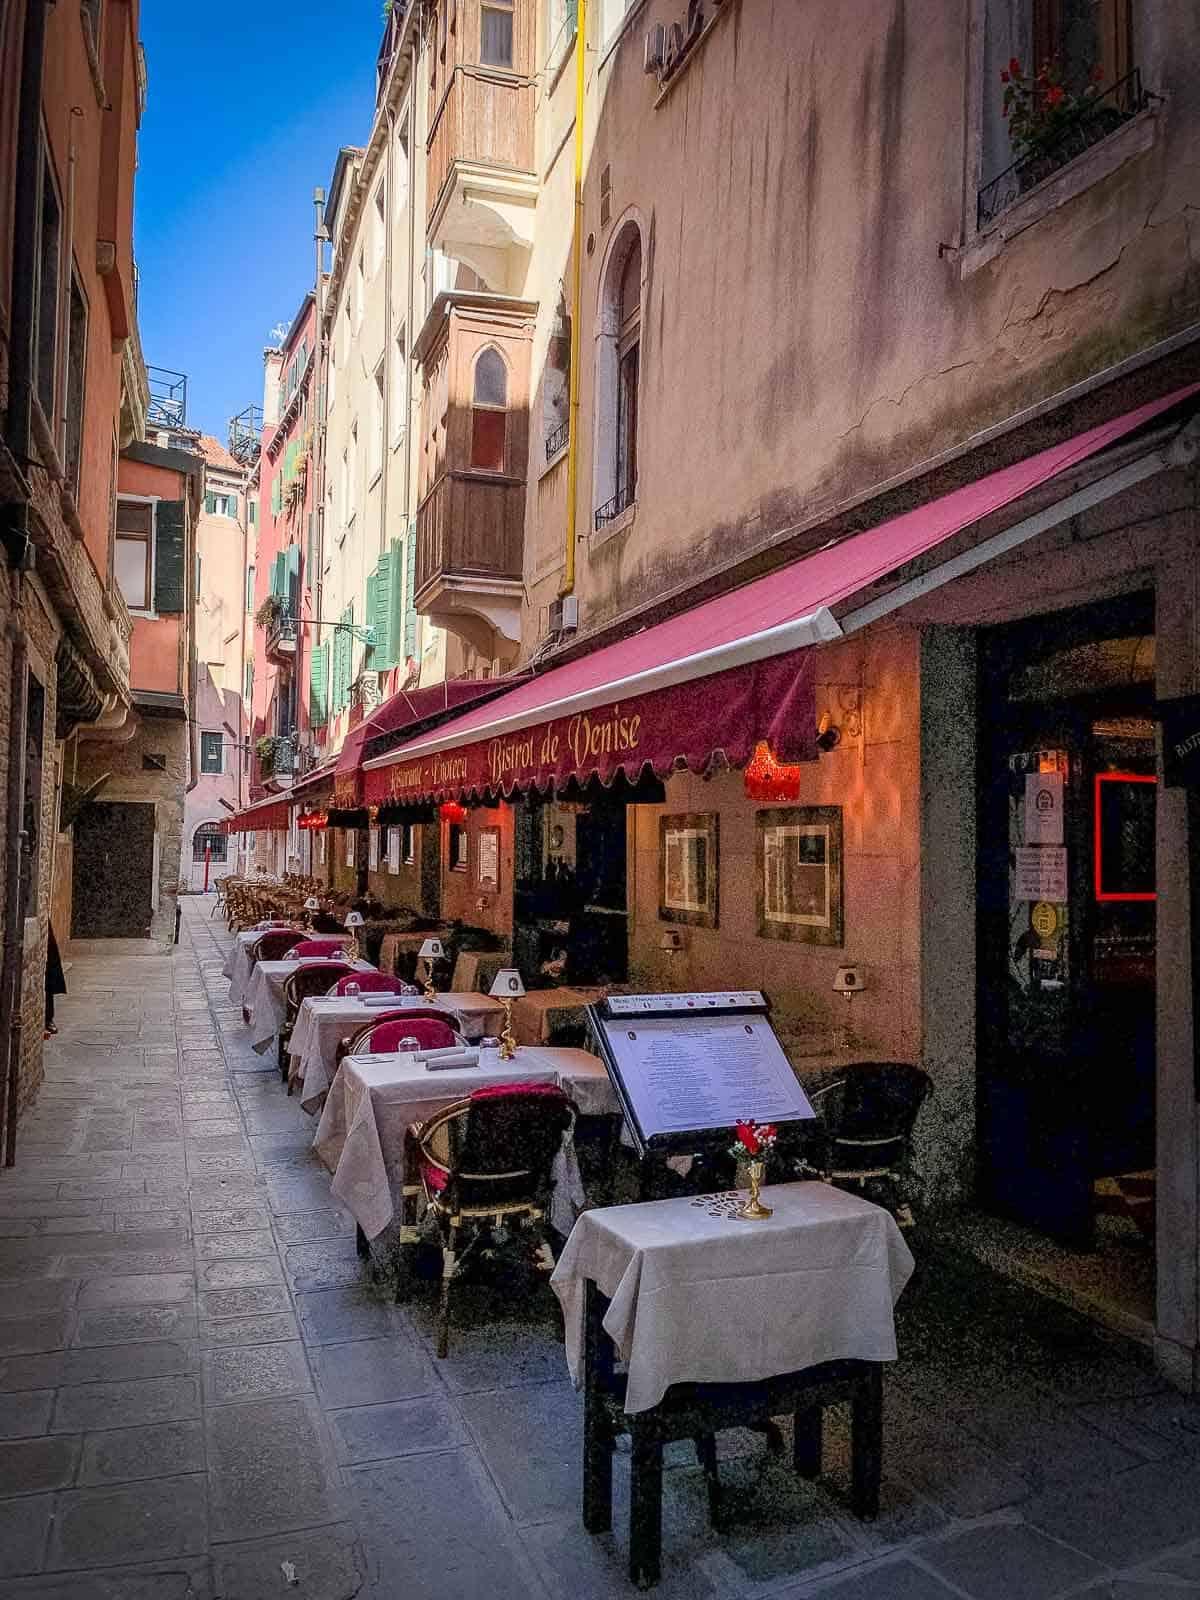 restaurans in Venice